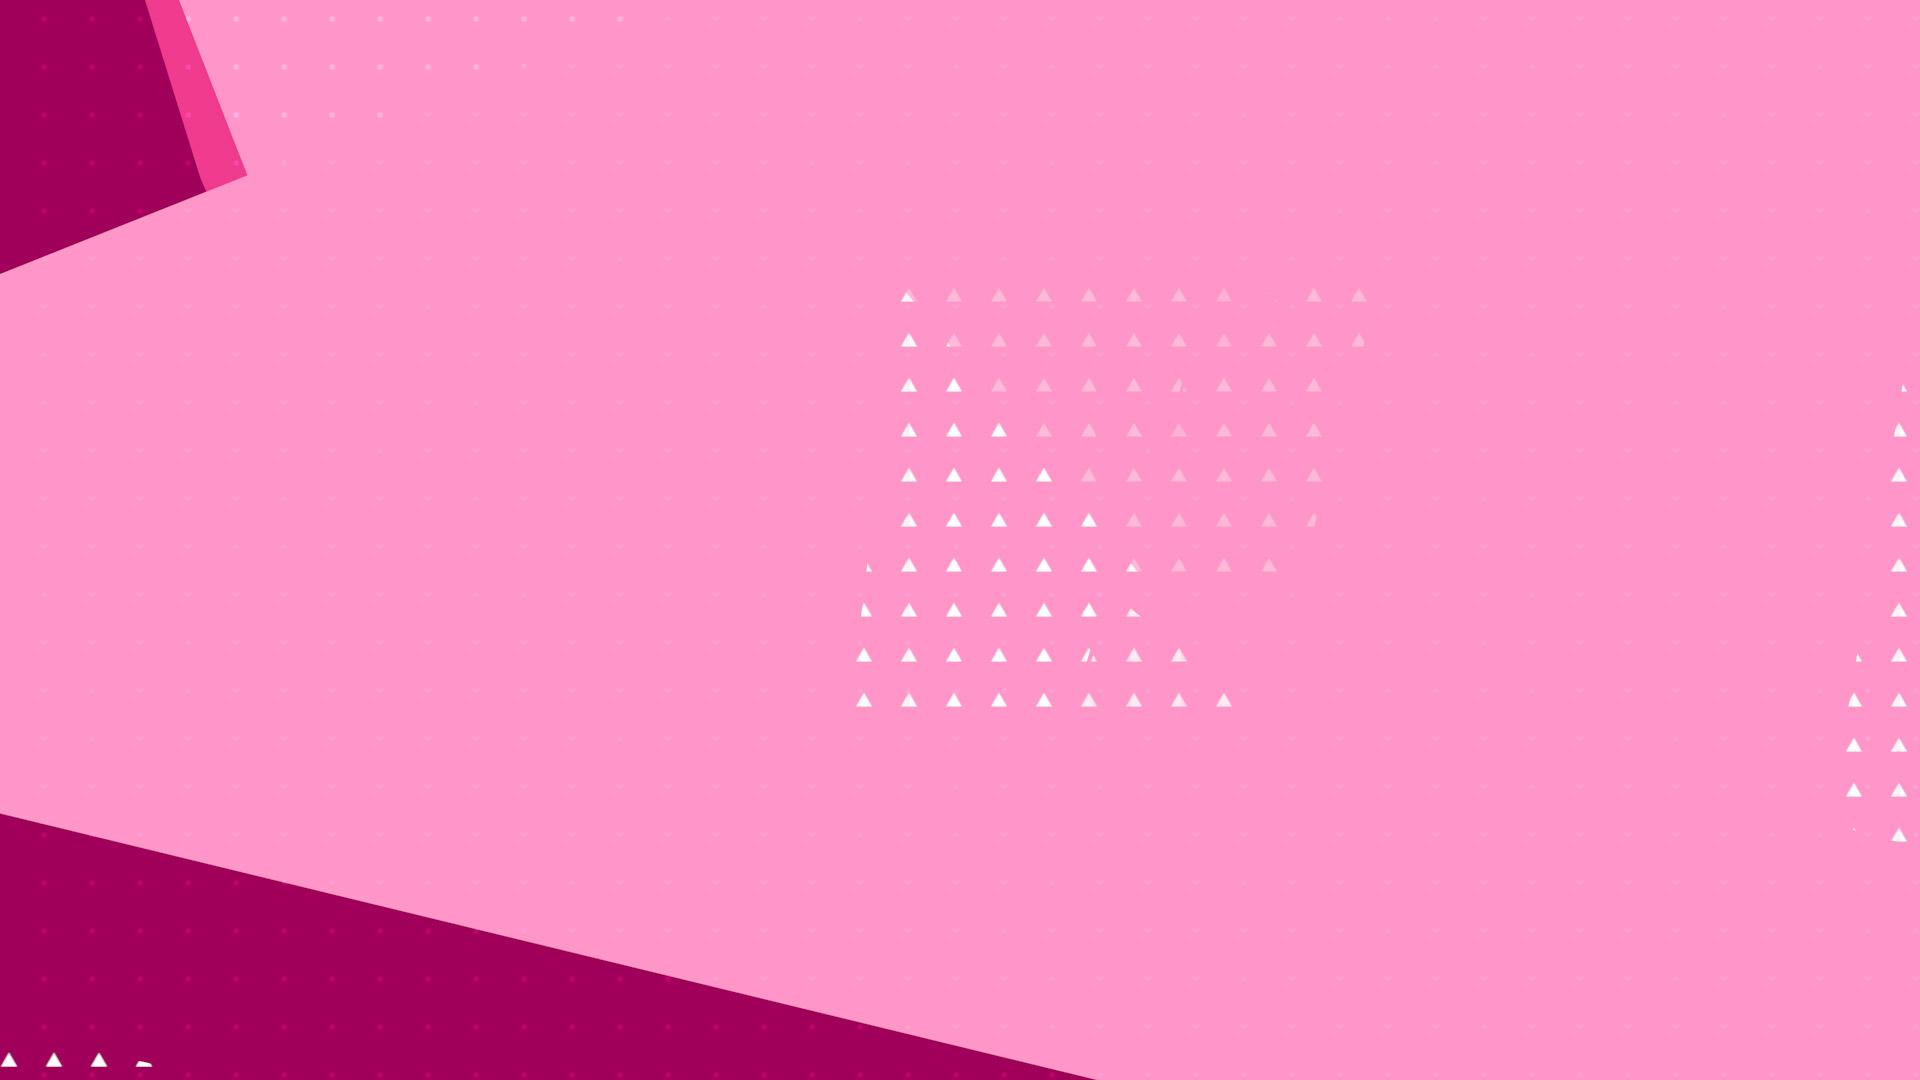 wipe_3_pink117